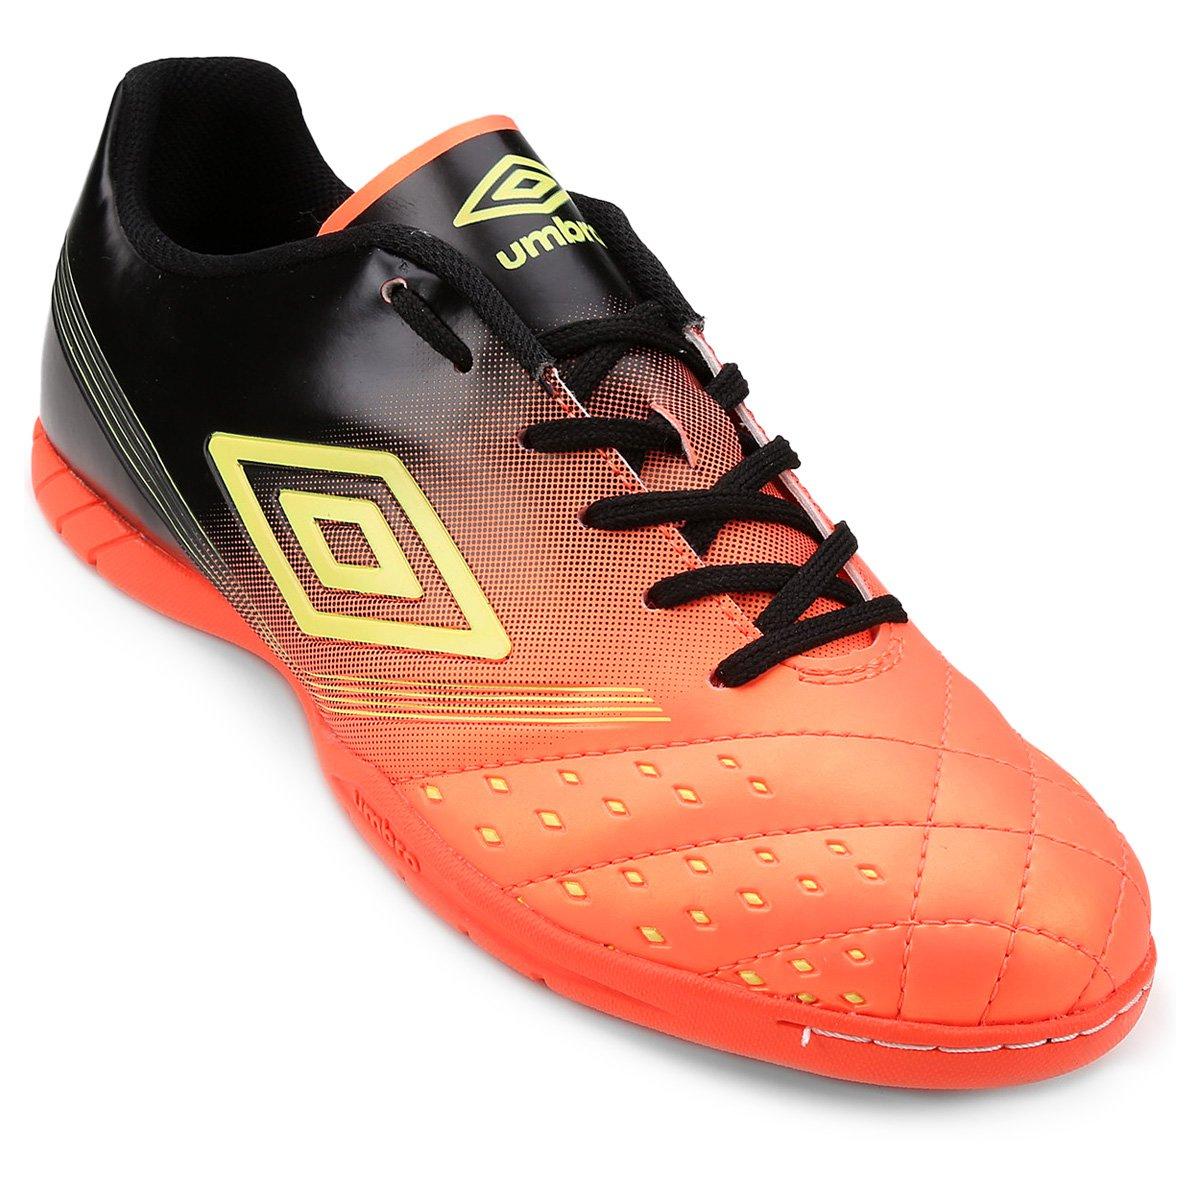 cc23aed639 Chuteira Futsal Umbro Fifty - Preto e Laranja - Compre Agora